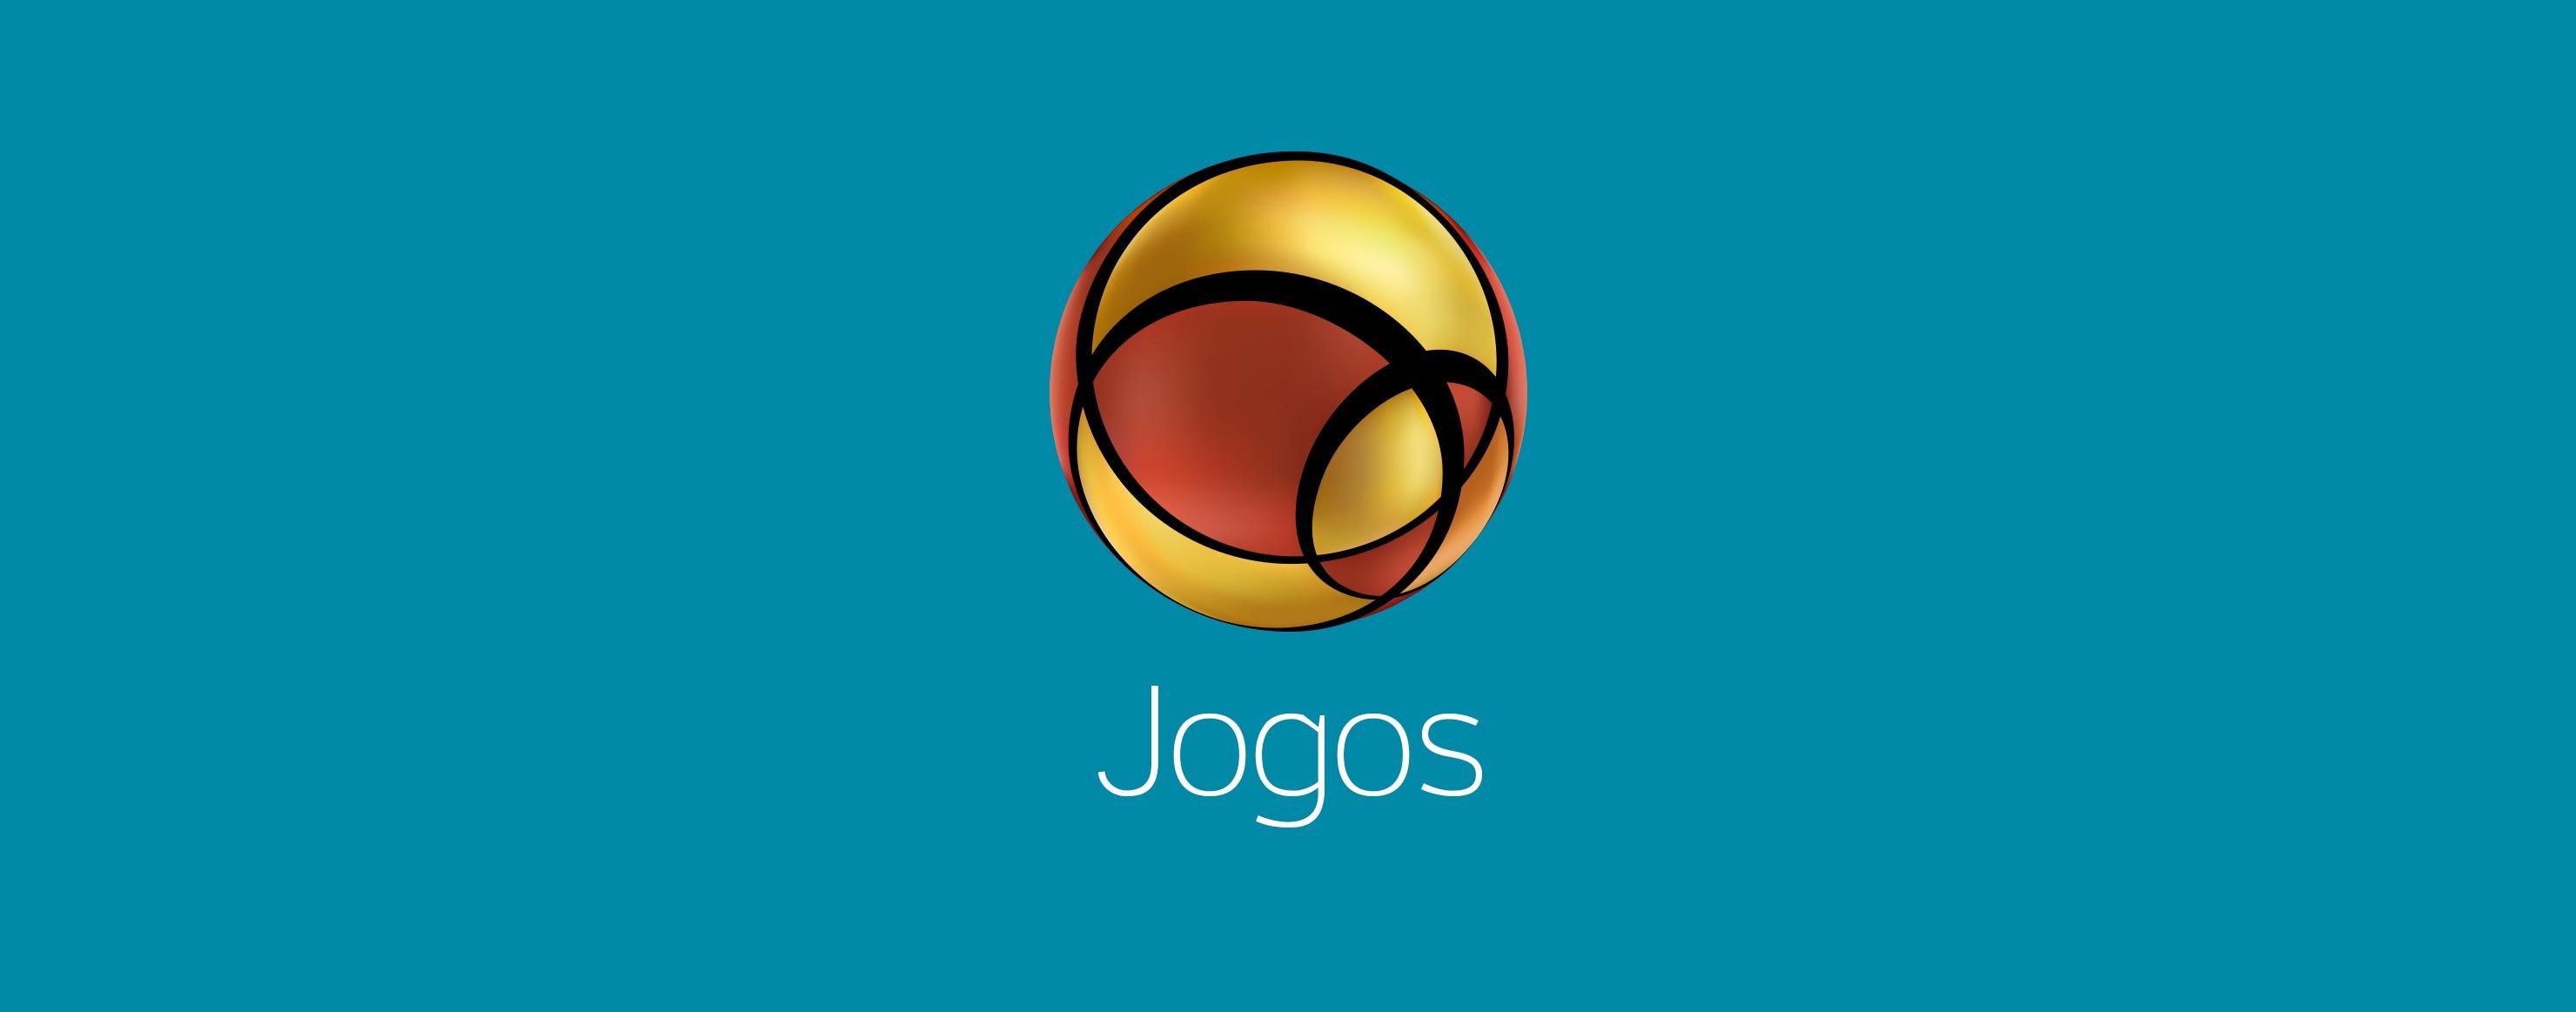 Calendario Da Copa 2019 Jogos Do Brasil Para Imprimir Más Caliente Jogos Uol Entretenimento